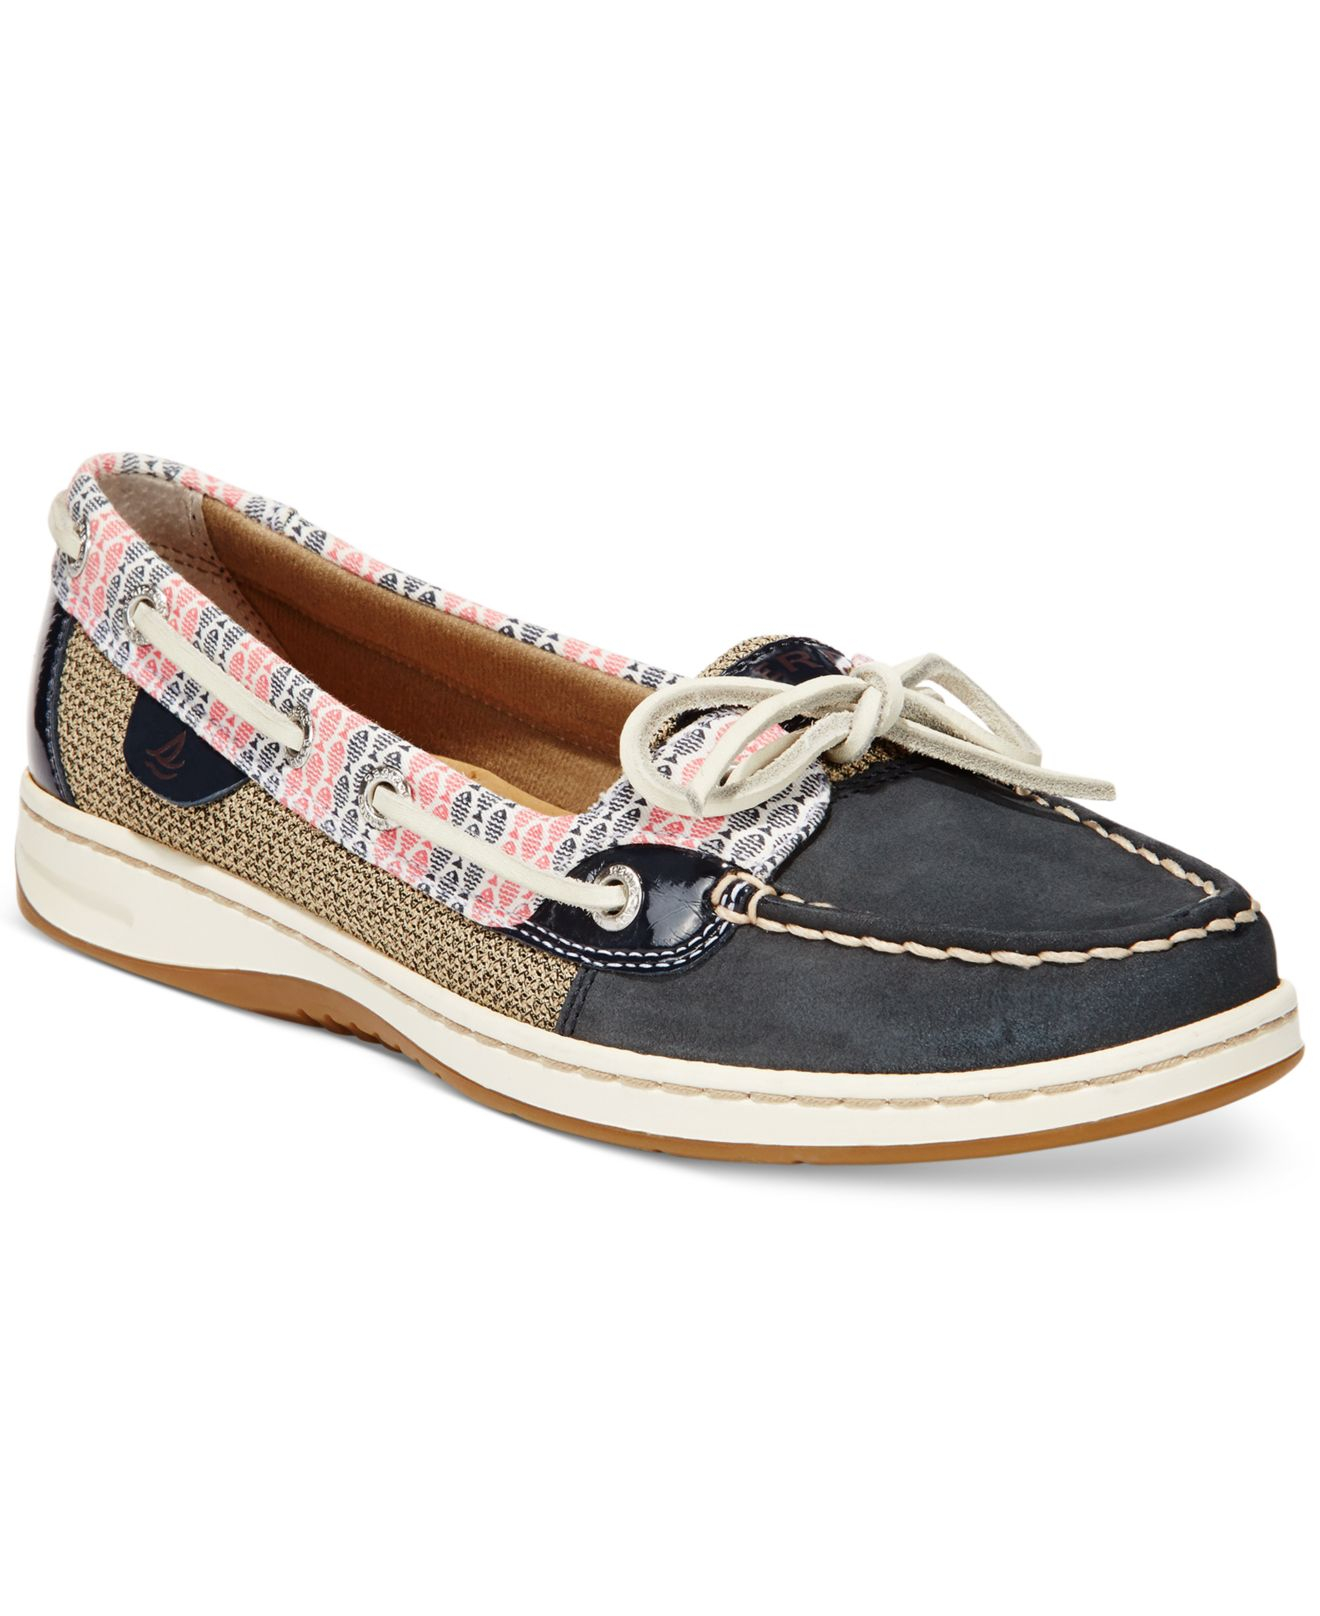 da51f473587 Lyst - Sperry Top-Sider Women s Angelfish Stripe Print Boat Shoes in ...